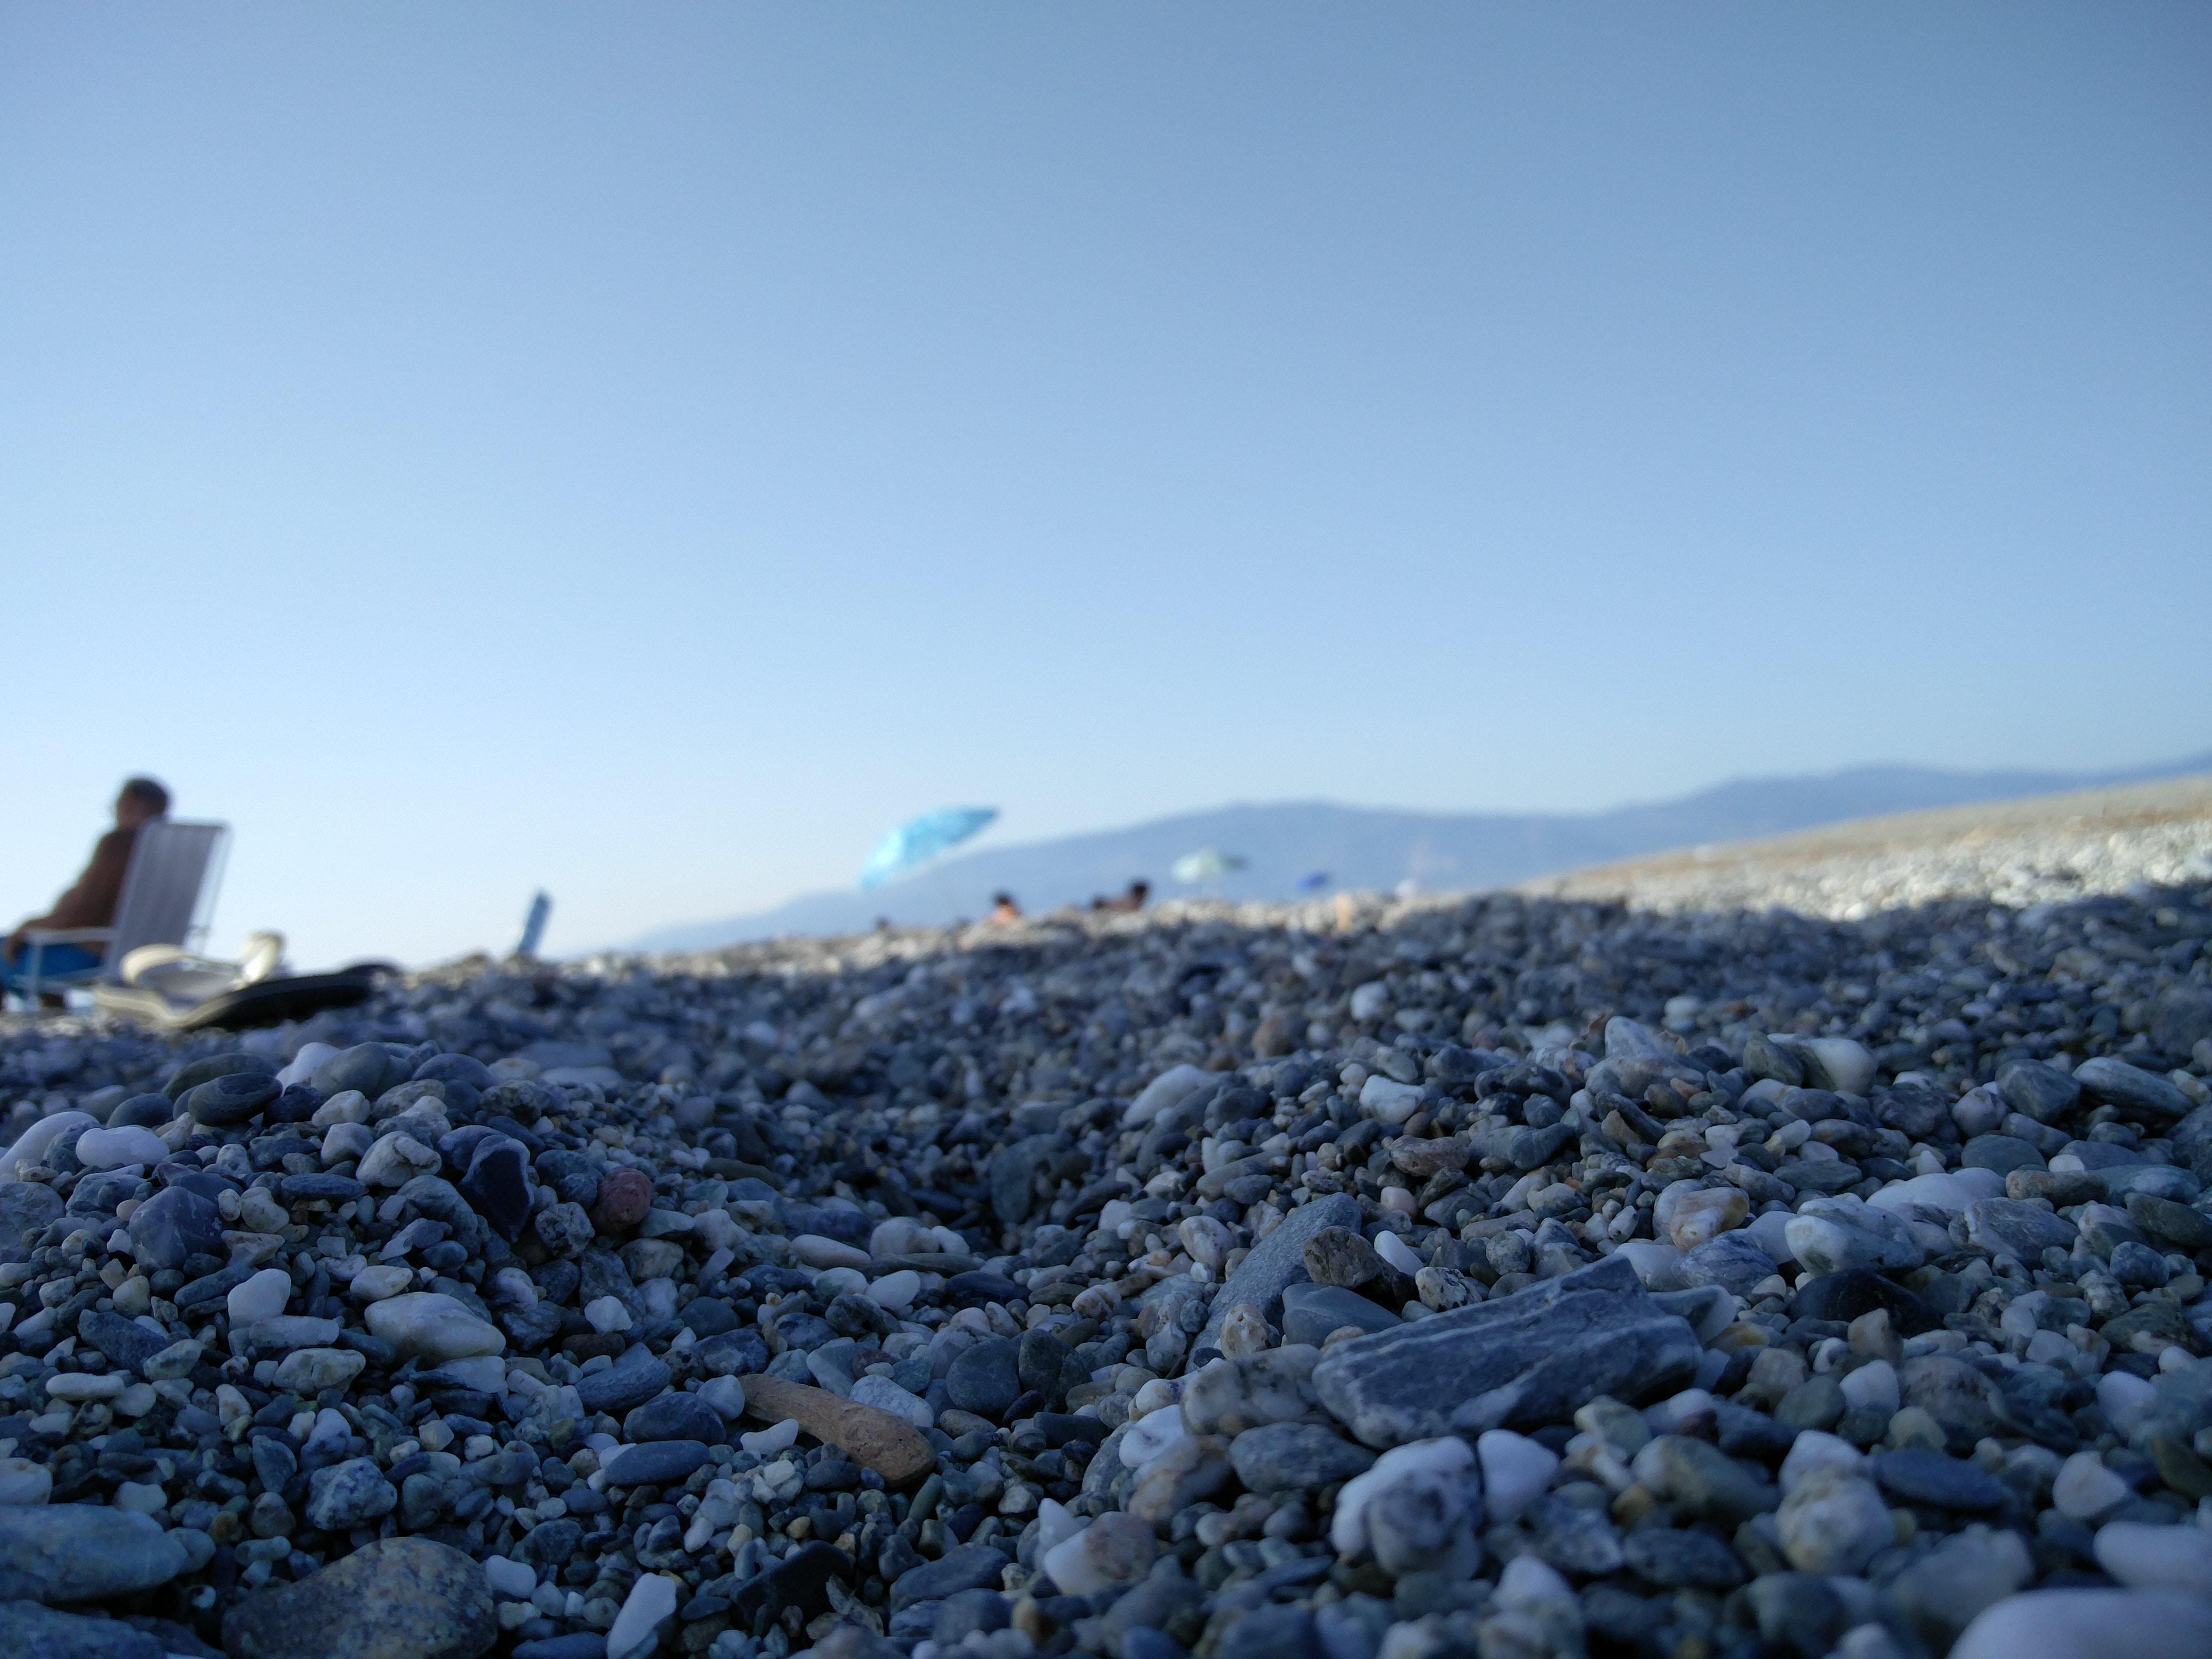 Free Unsplash photo from Domenico  Michienzi